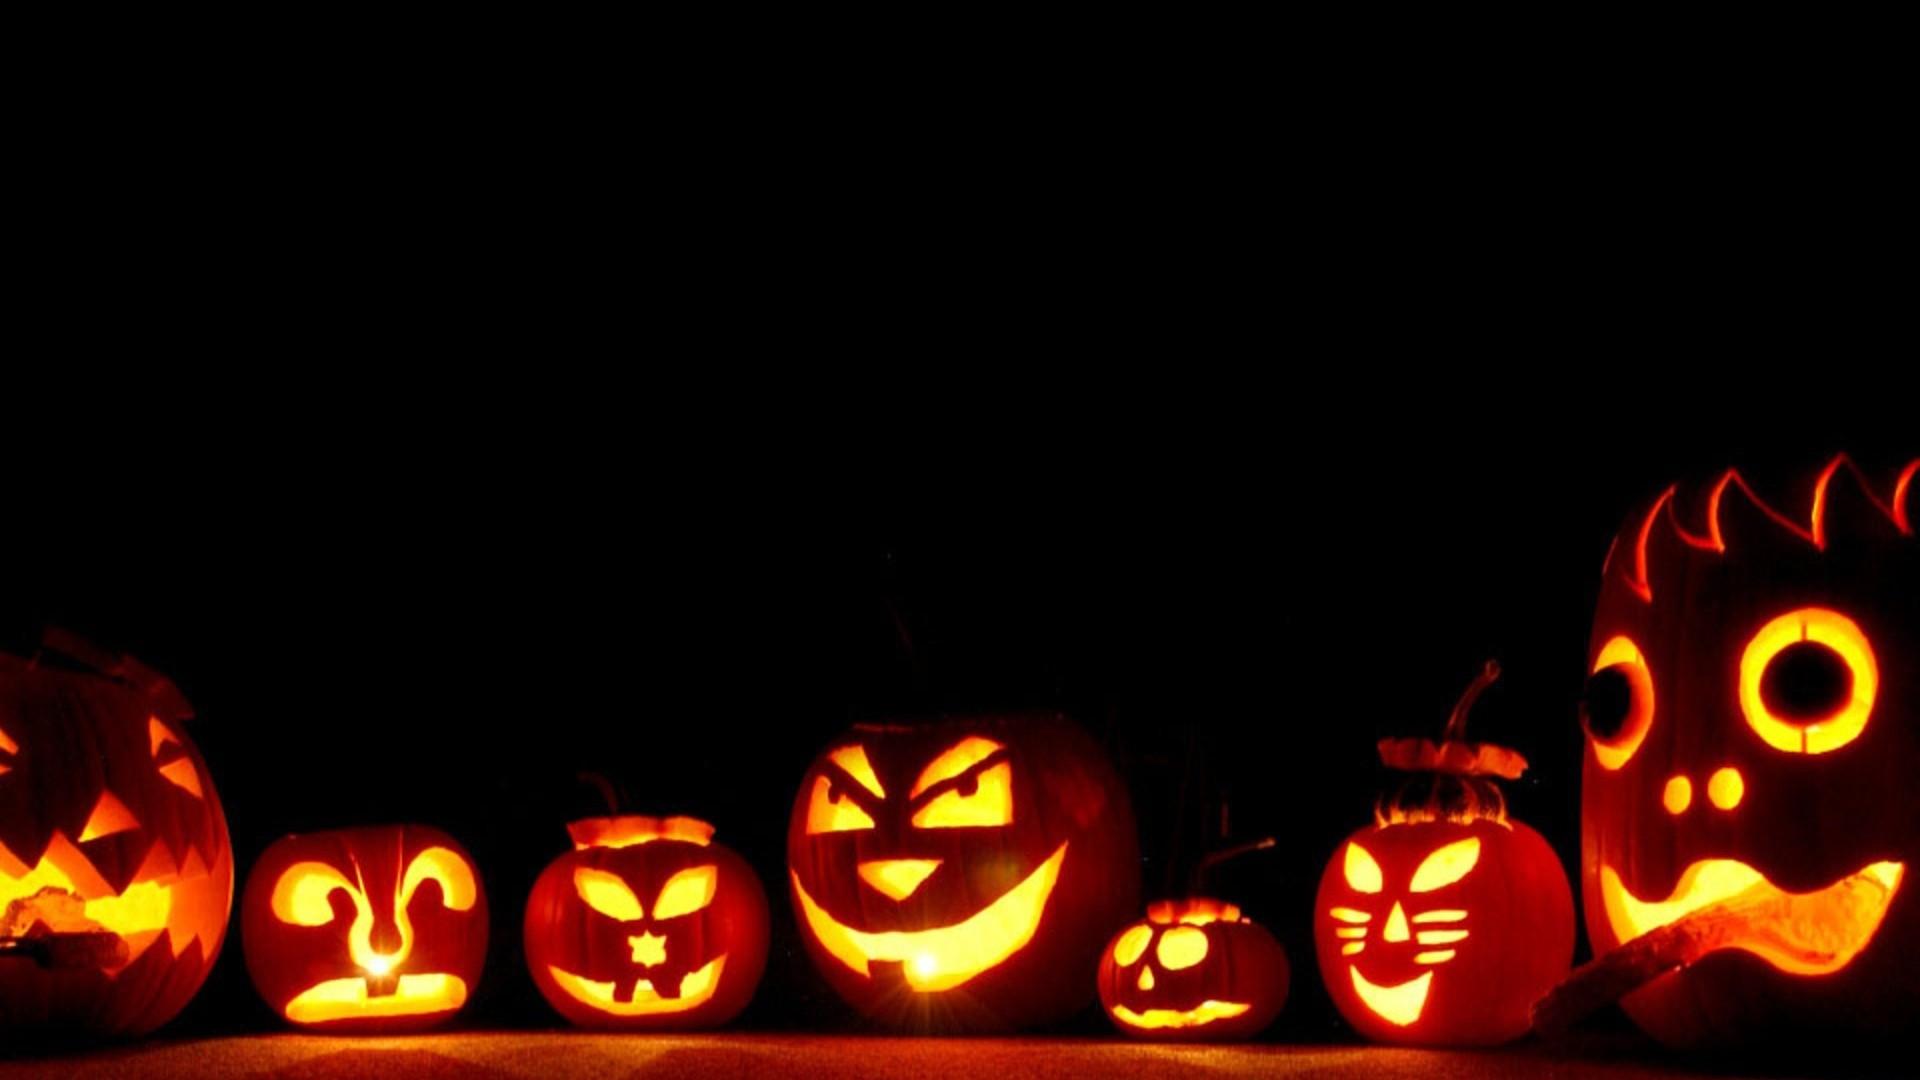 Spirit Halloween HD Wallpapers Backgrounds 1920×1080.